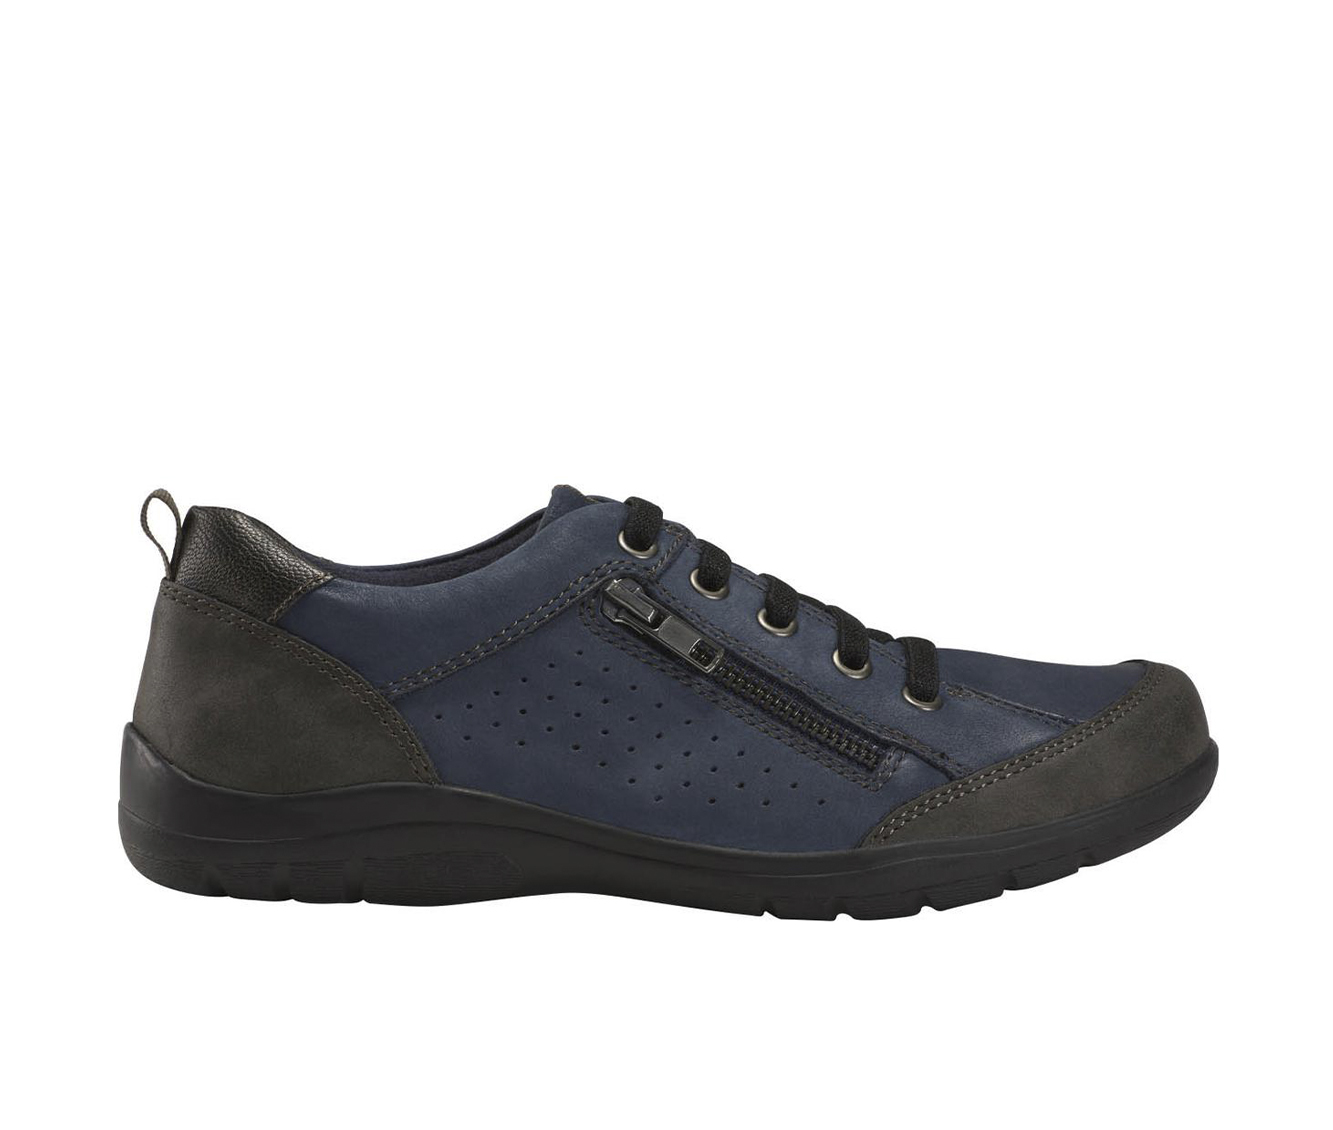 Earth Origins Rapid 2 Reeve Women's Shoe (Blue Leather)